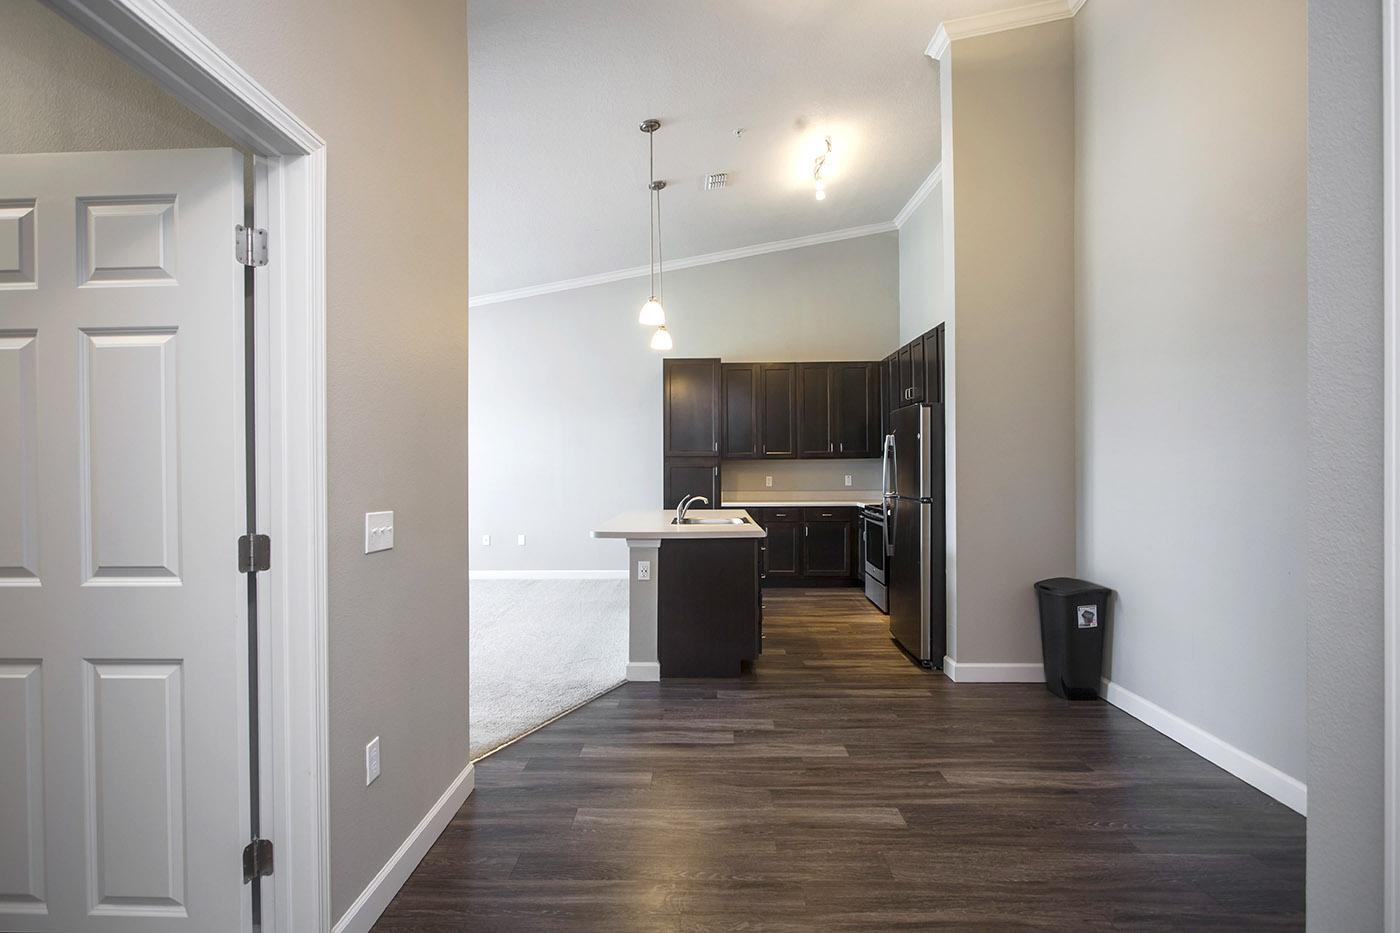 CharlestonEdge-Rental-Apartment-Brandon-Tampa-Florida-Pool-Bedrooms-Interior-6.jpg